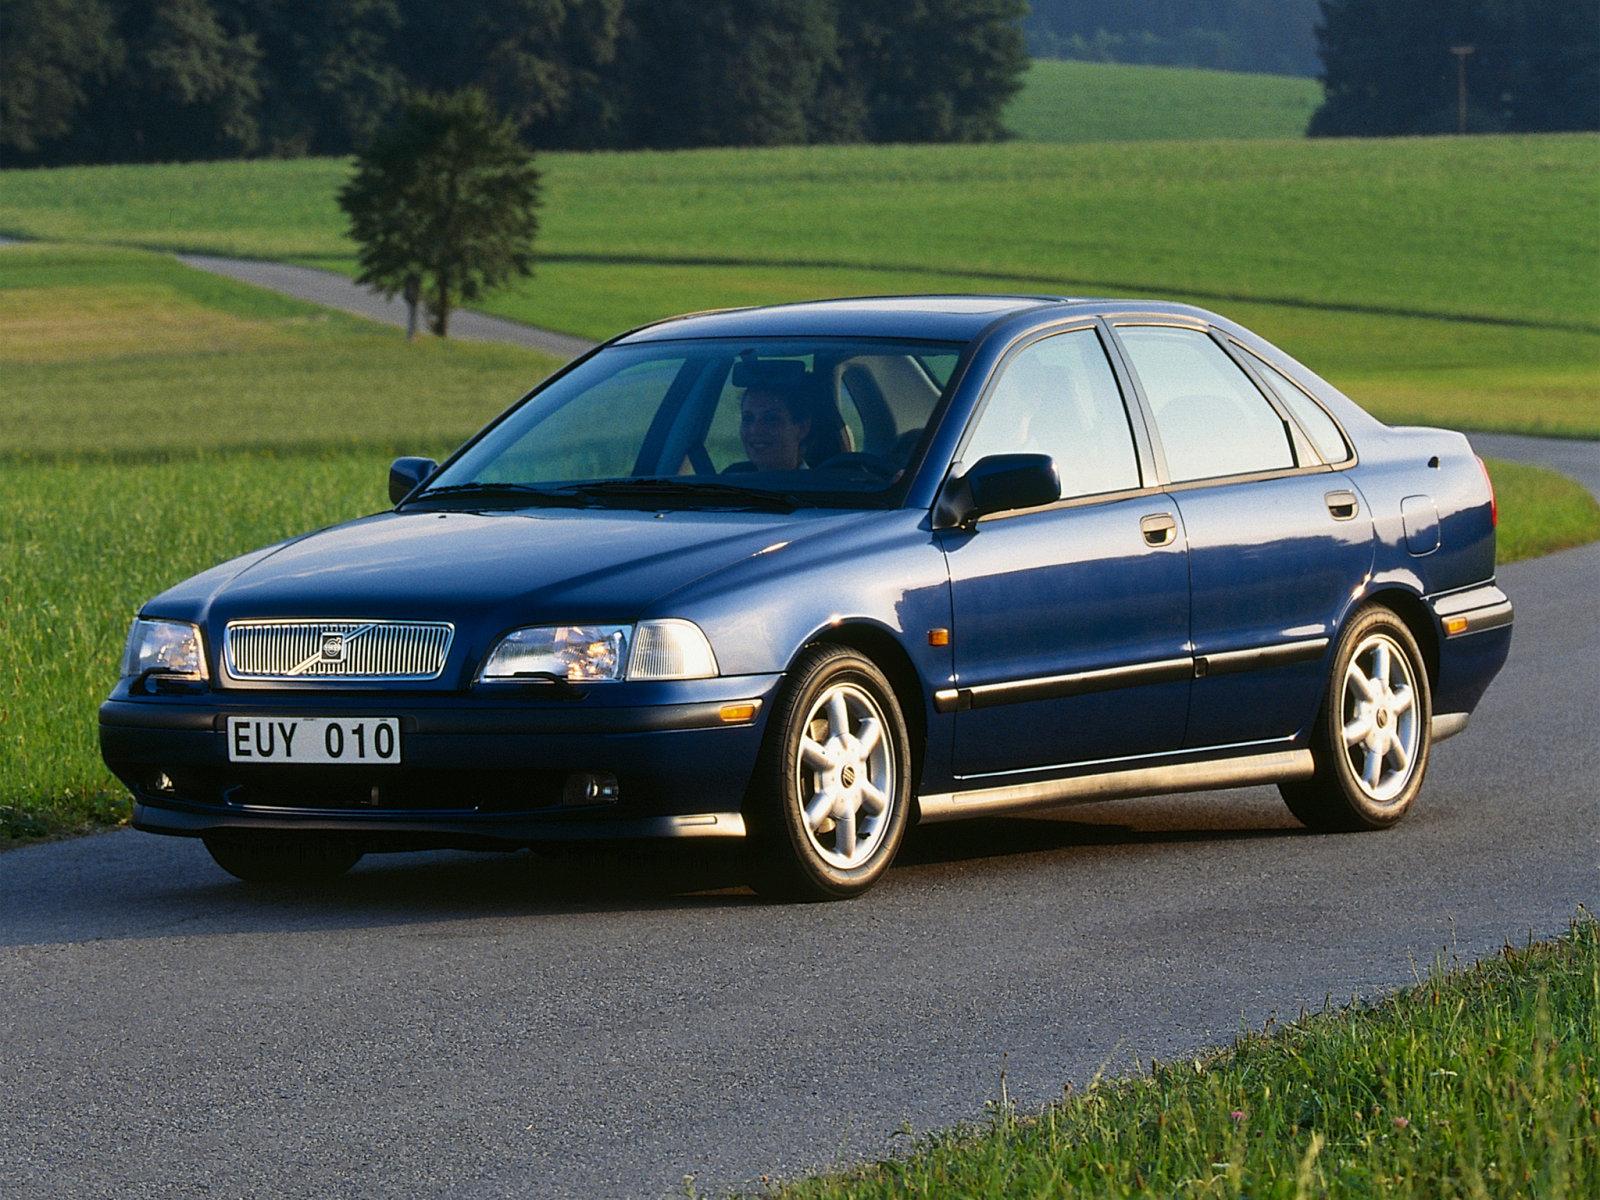 sedan laporte adrien large awd brais turbo on s cccb volvo wheelwell